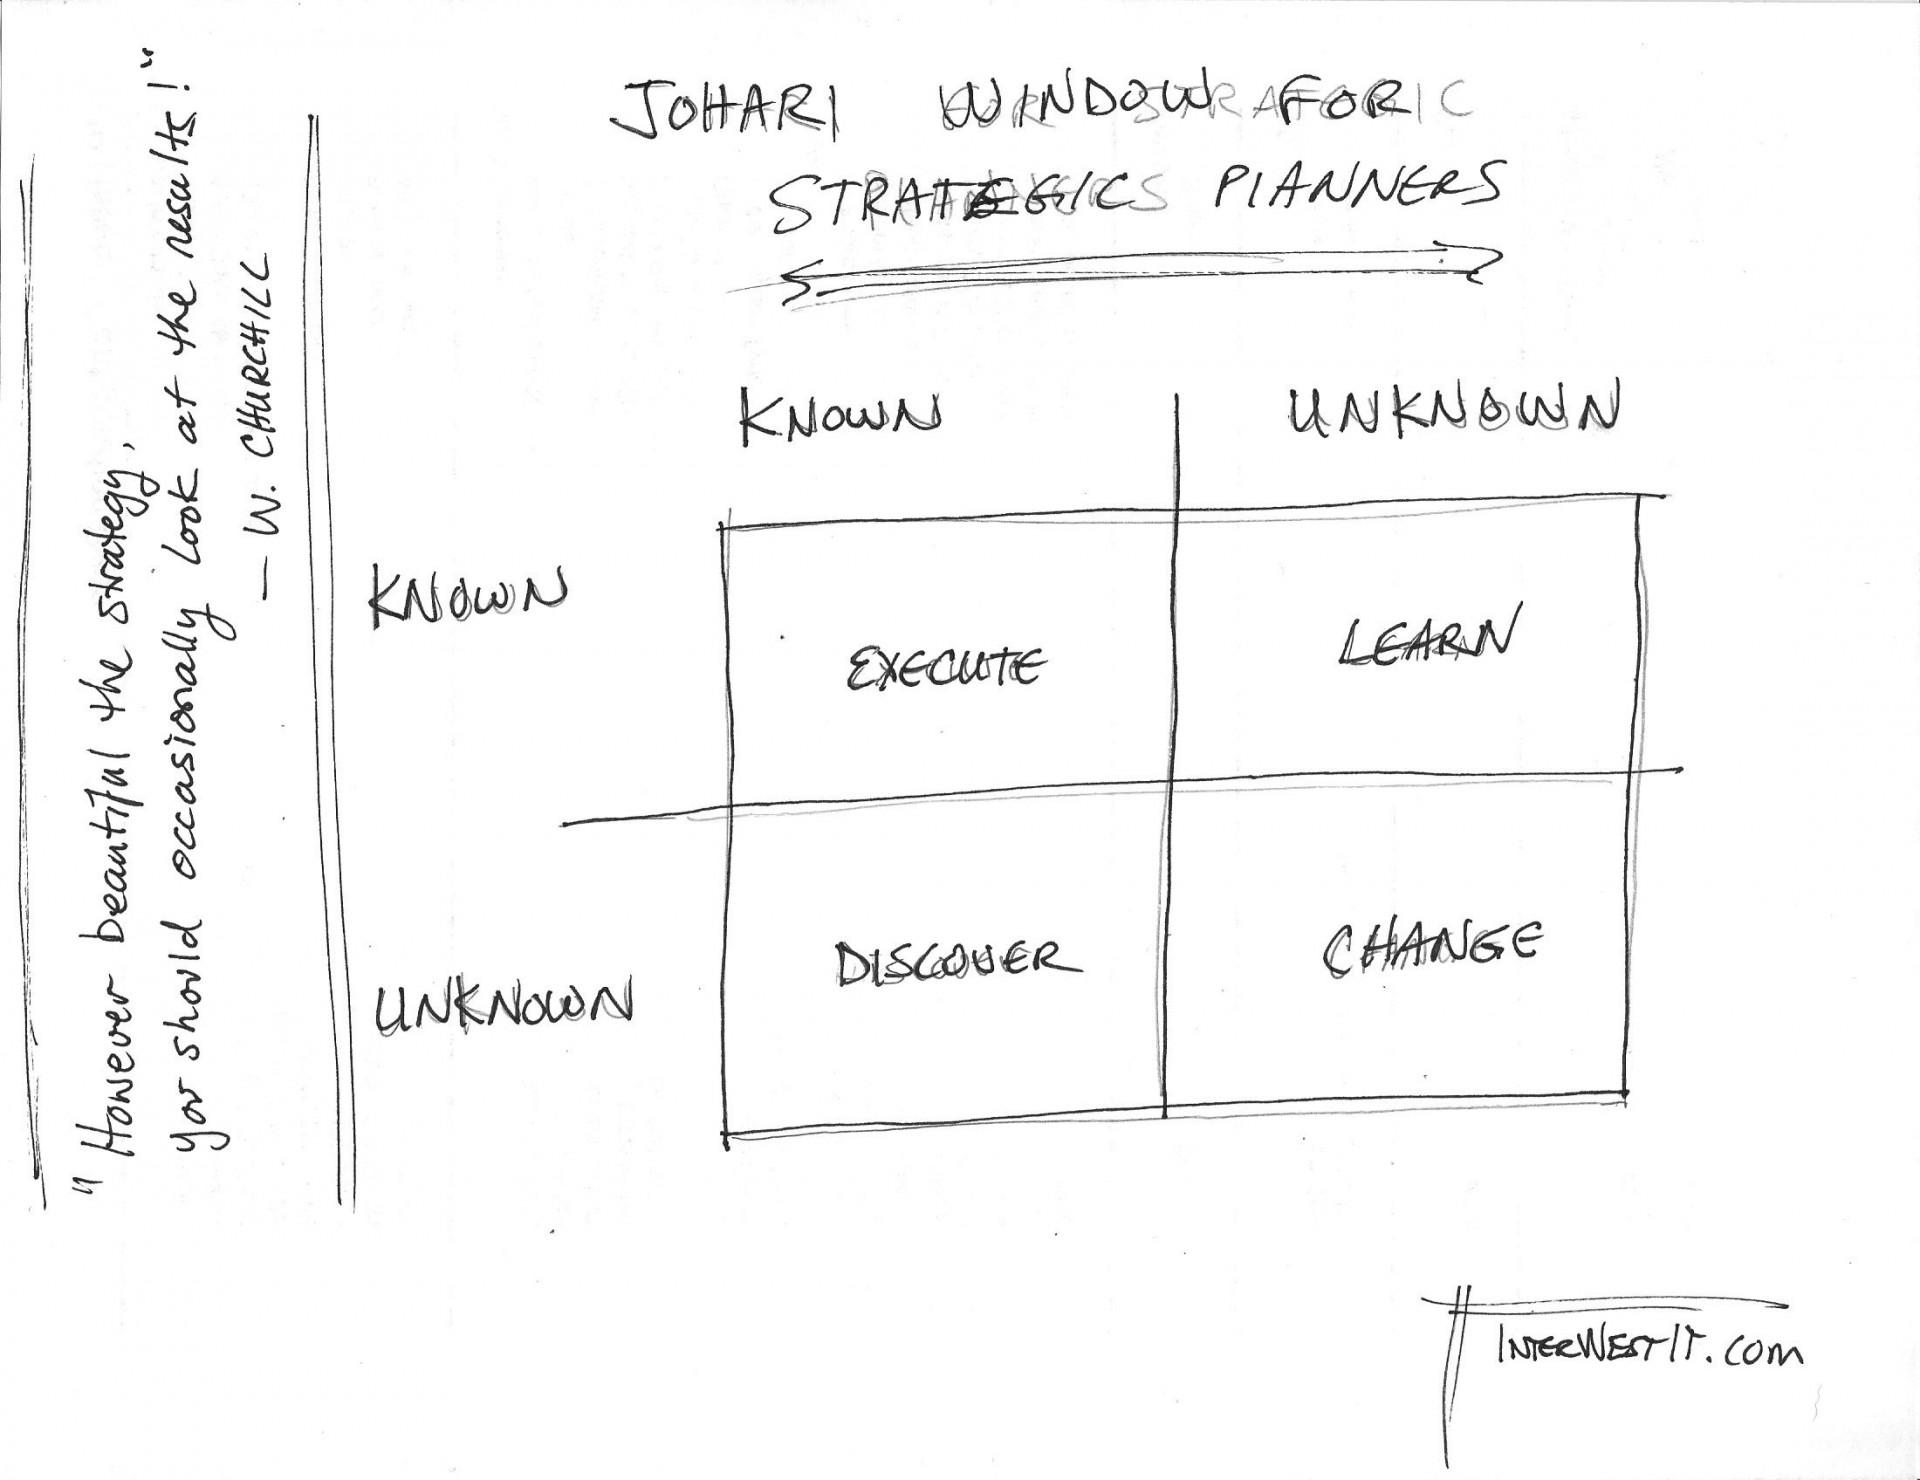 009 Johari Strategic Plan Essay Example Isaac Asimov Awful Essays On Creativity Intelligence 1920